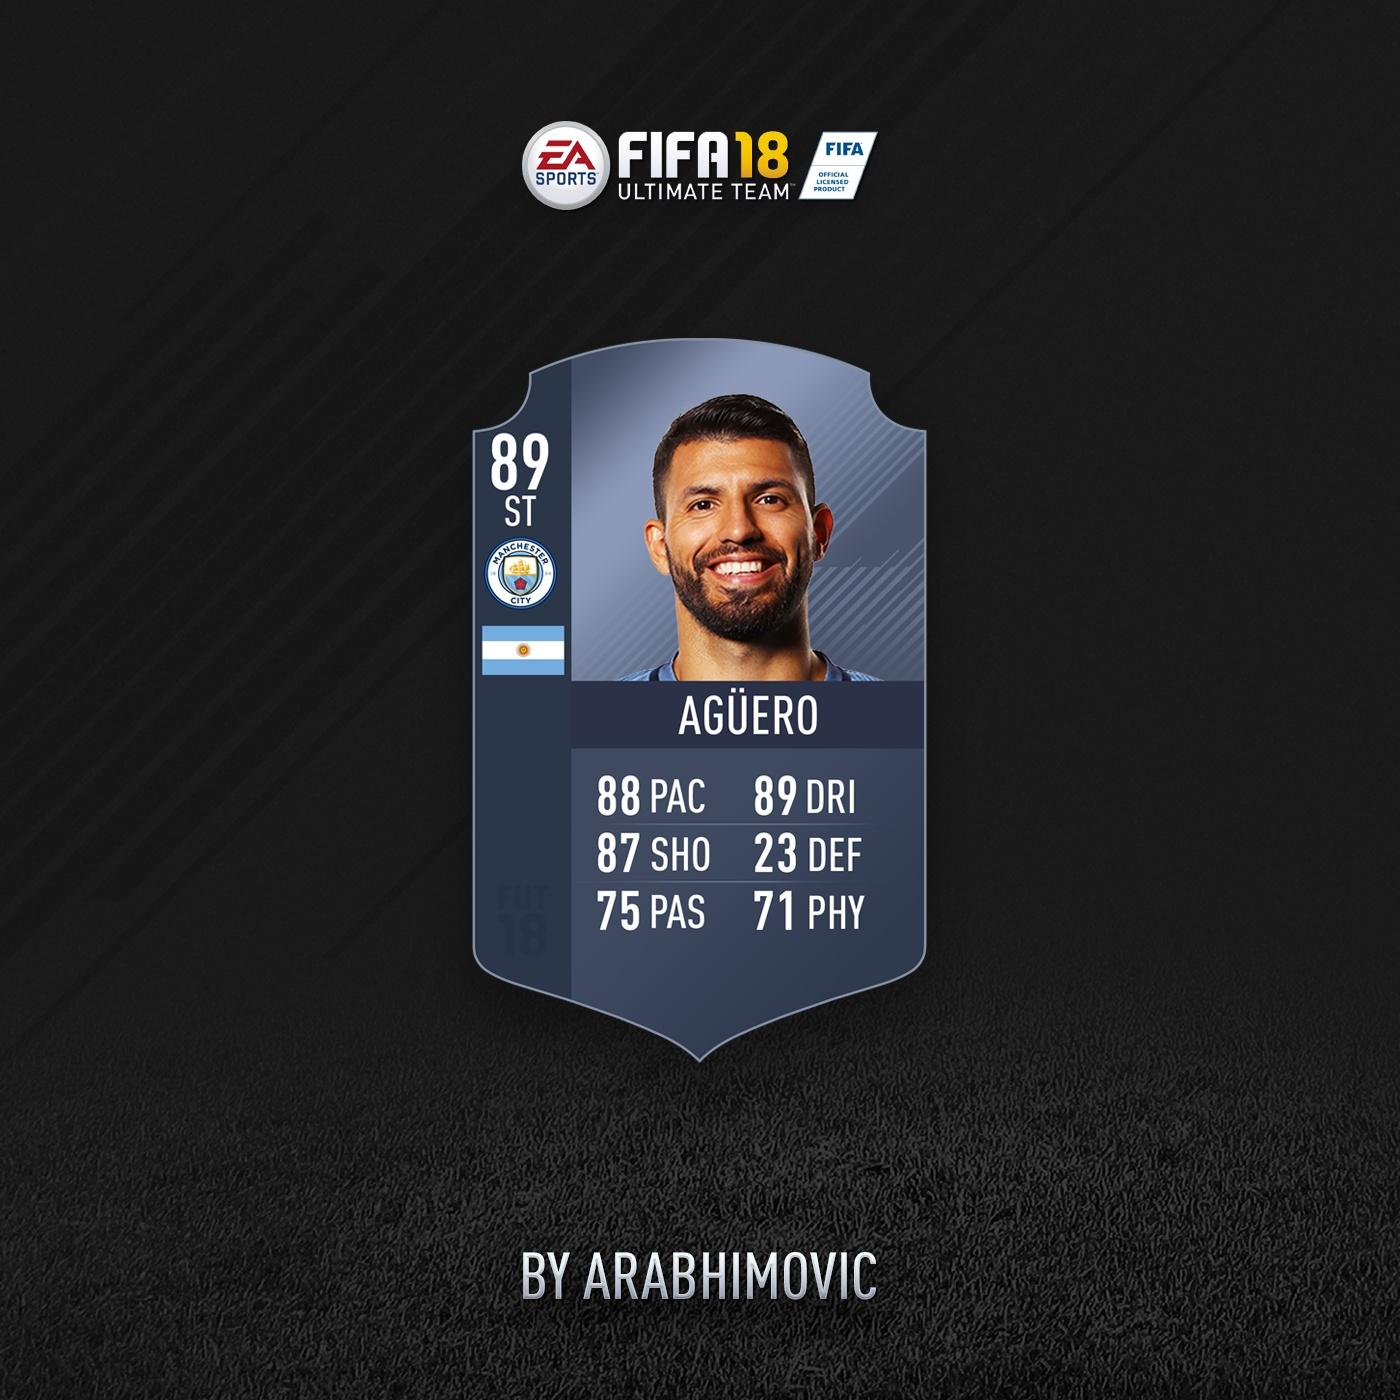 FIFA 18 HD CONCEPT CARD